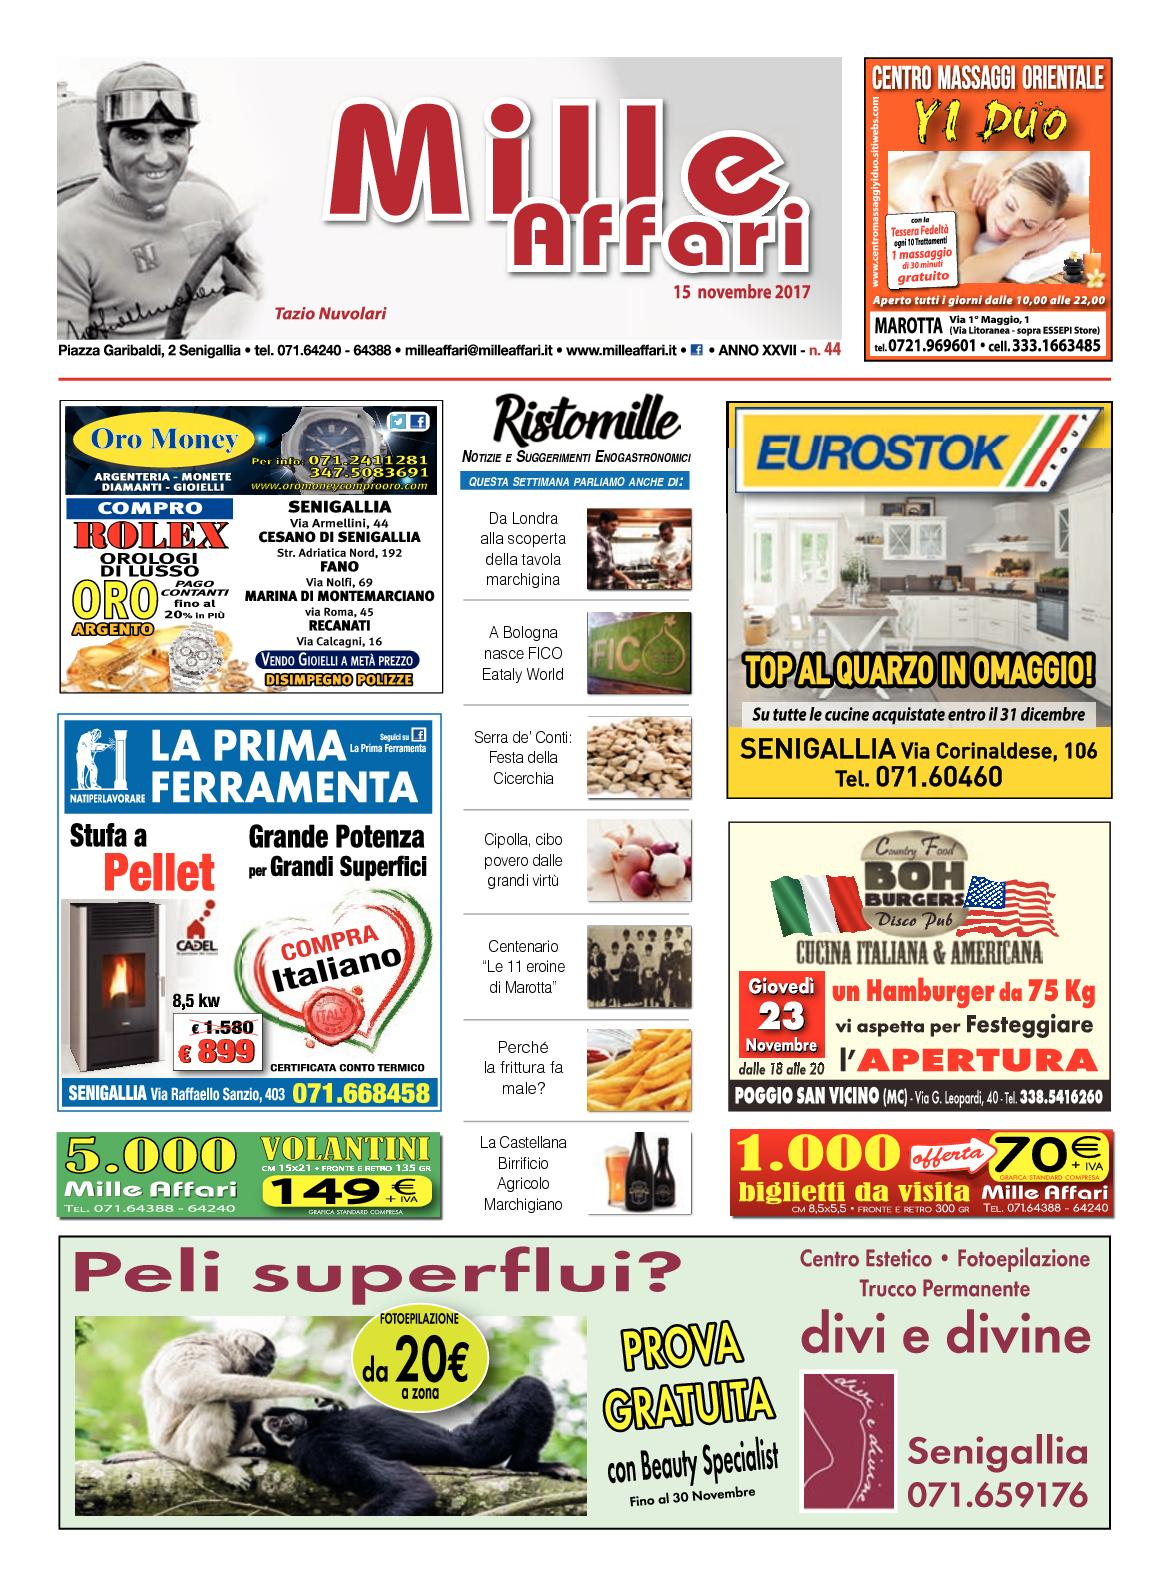 1800 FILTRI NATURALI CANAPA EXTRA SOTTILI SLIM 5,7 MM OFFERTA !!!! BRAVO REX